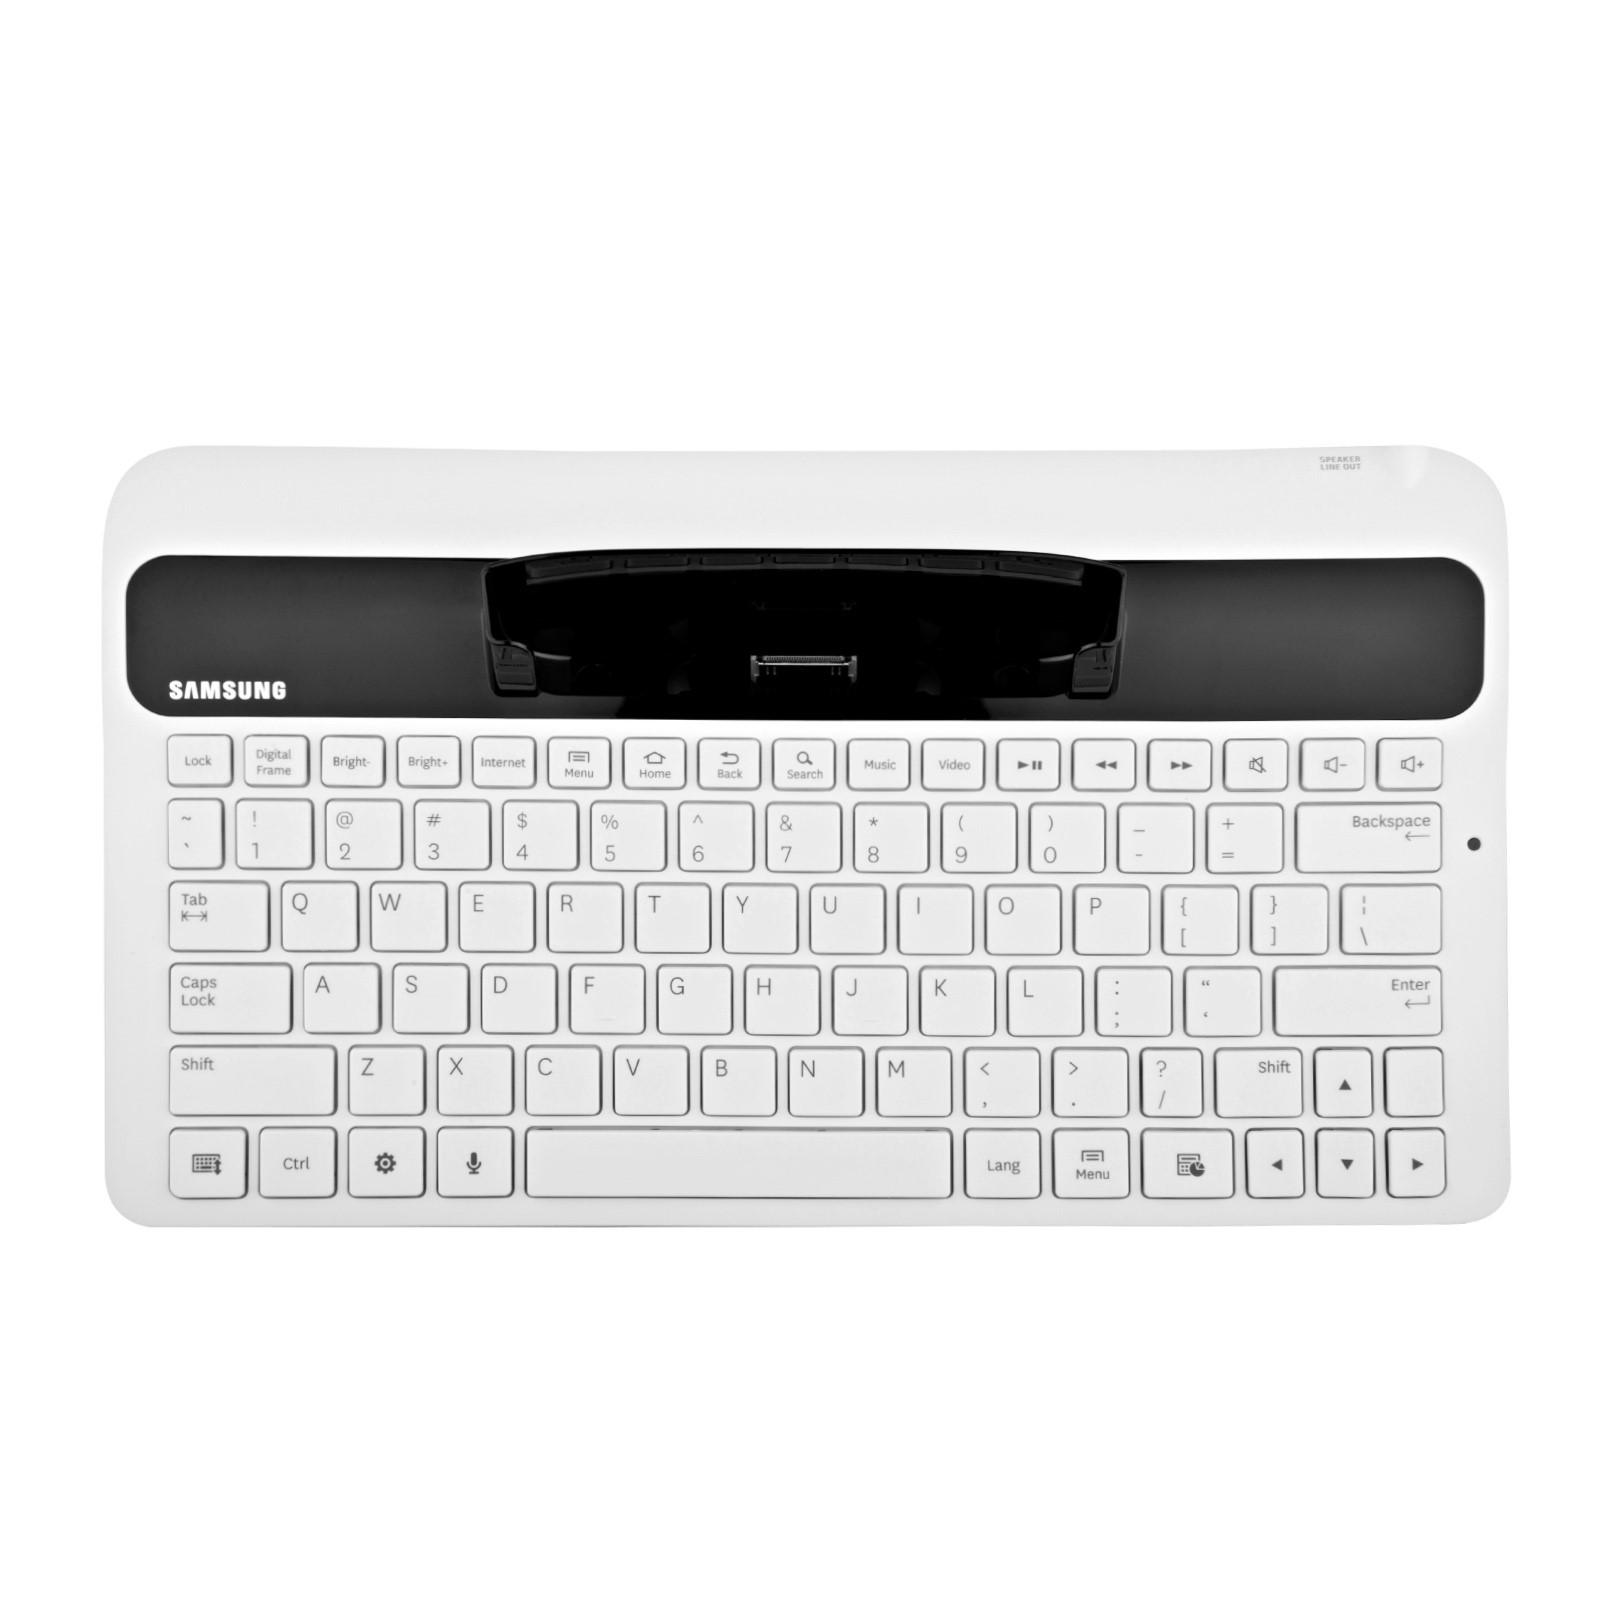 Techrabbit $5 Sale: M-Edge Stealth PRO Universal XL Bluetooth Keyboard $5, Samsung Keyboard Dock for Galaxy Tab 7.0 $5 & More + free shipping